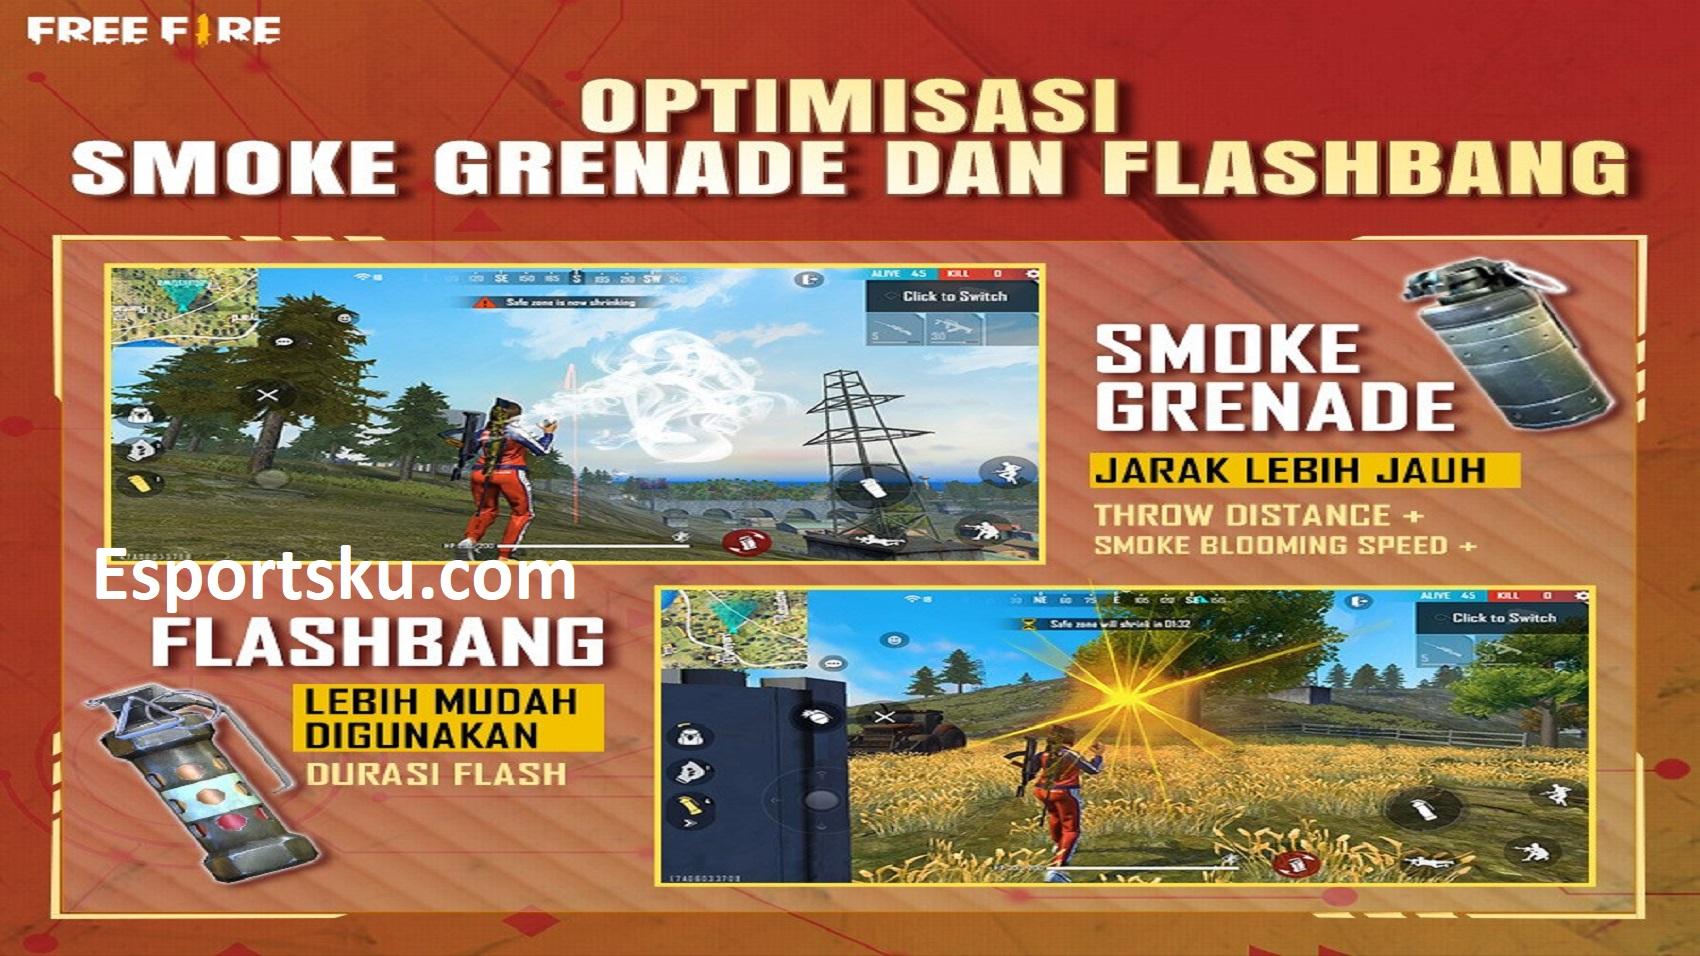 5 Kecerobohan Player Free Fire Pakai Flashbang FF